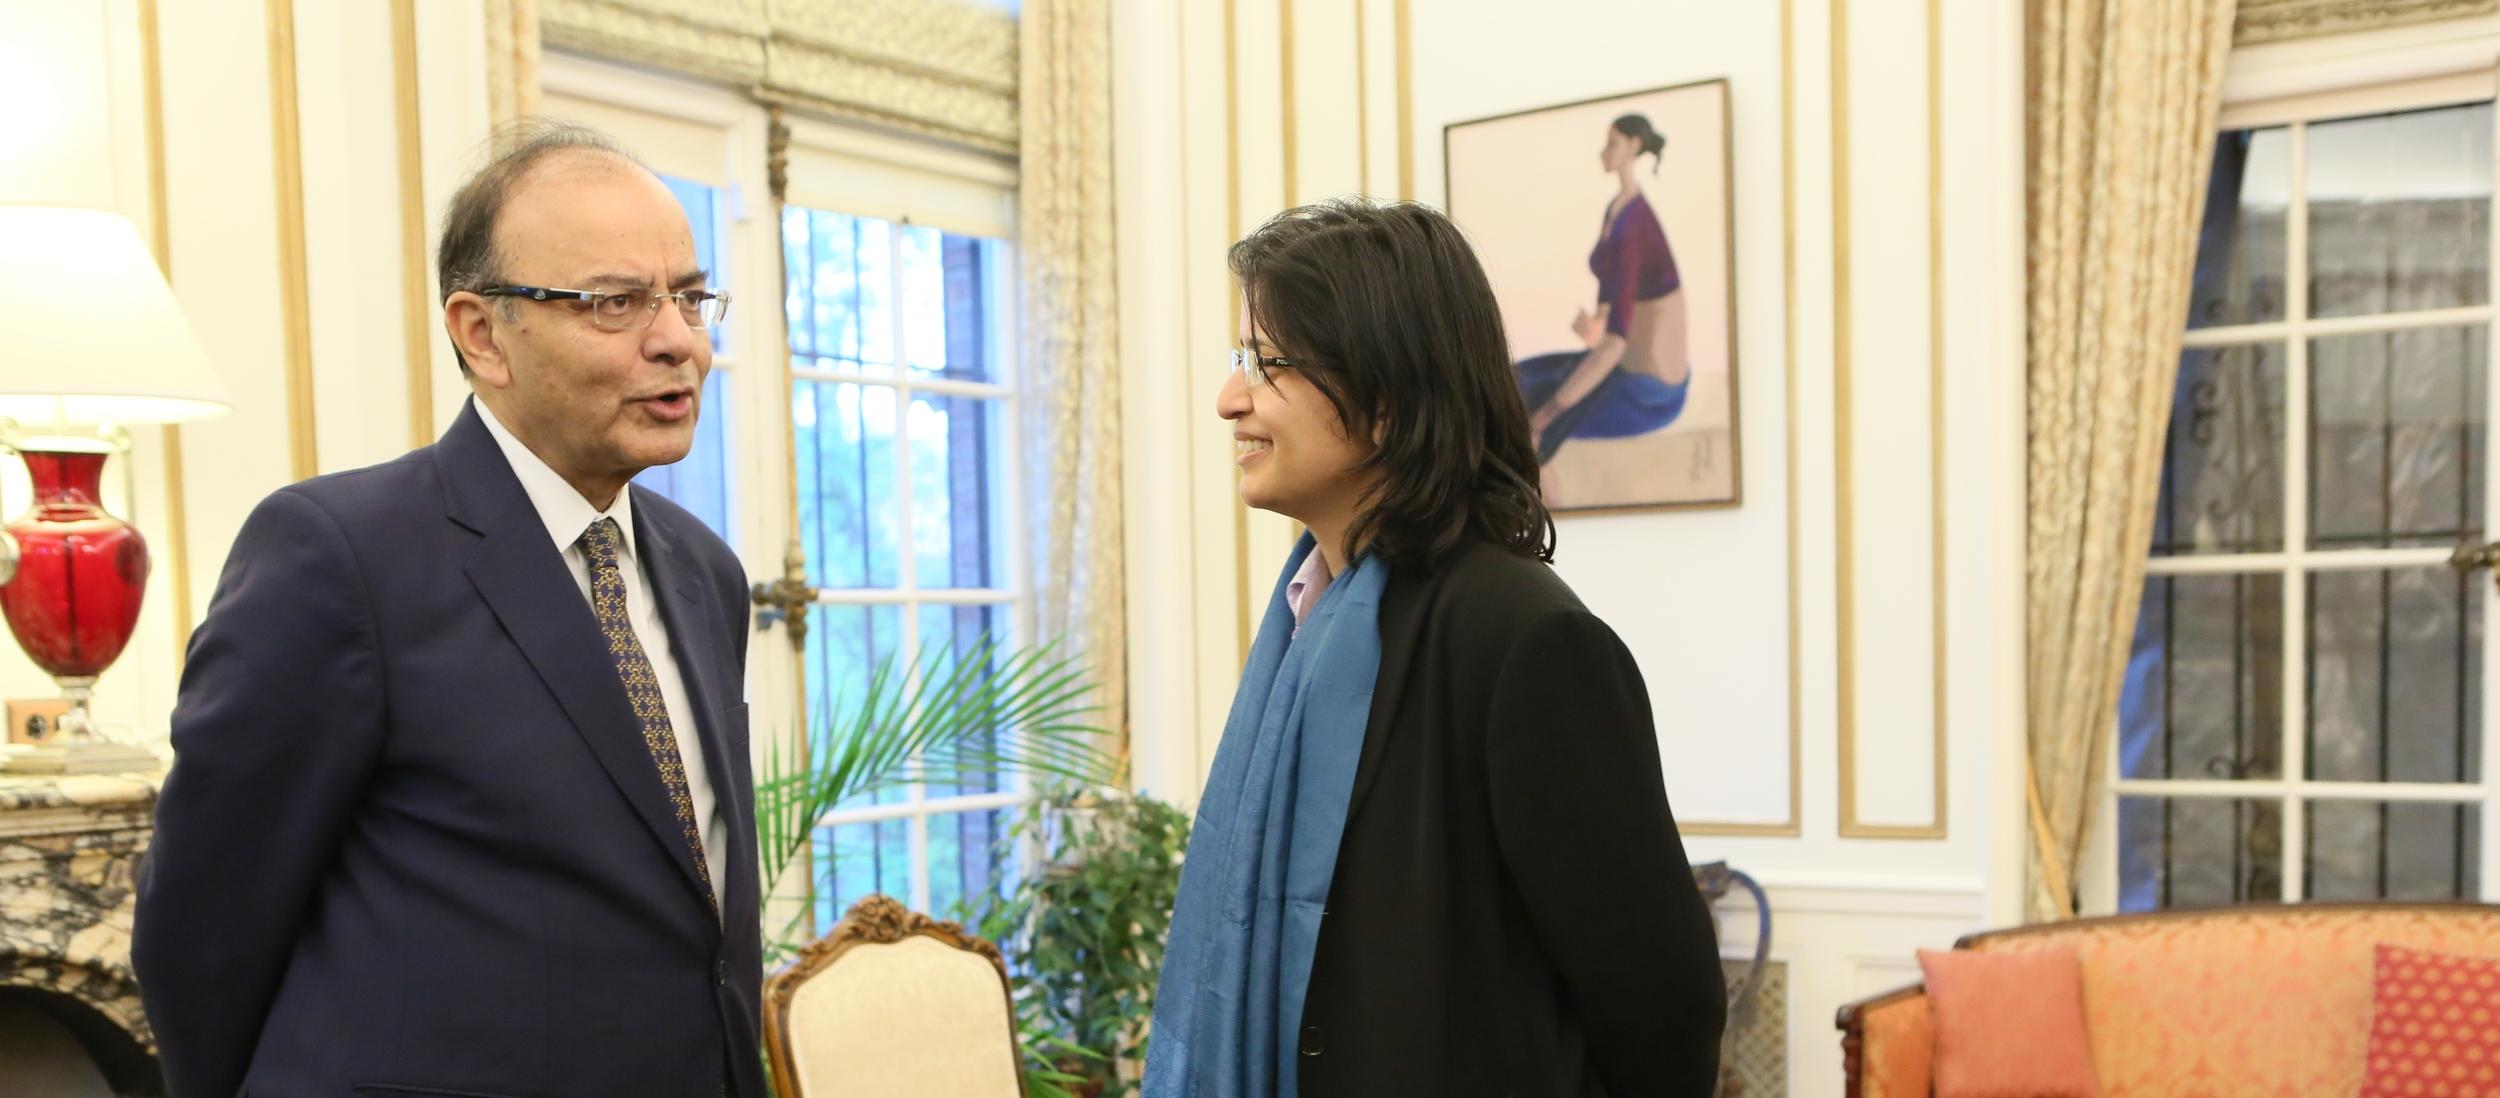 Arun Jaitley and Aparna Pande.JPG